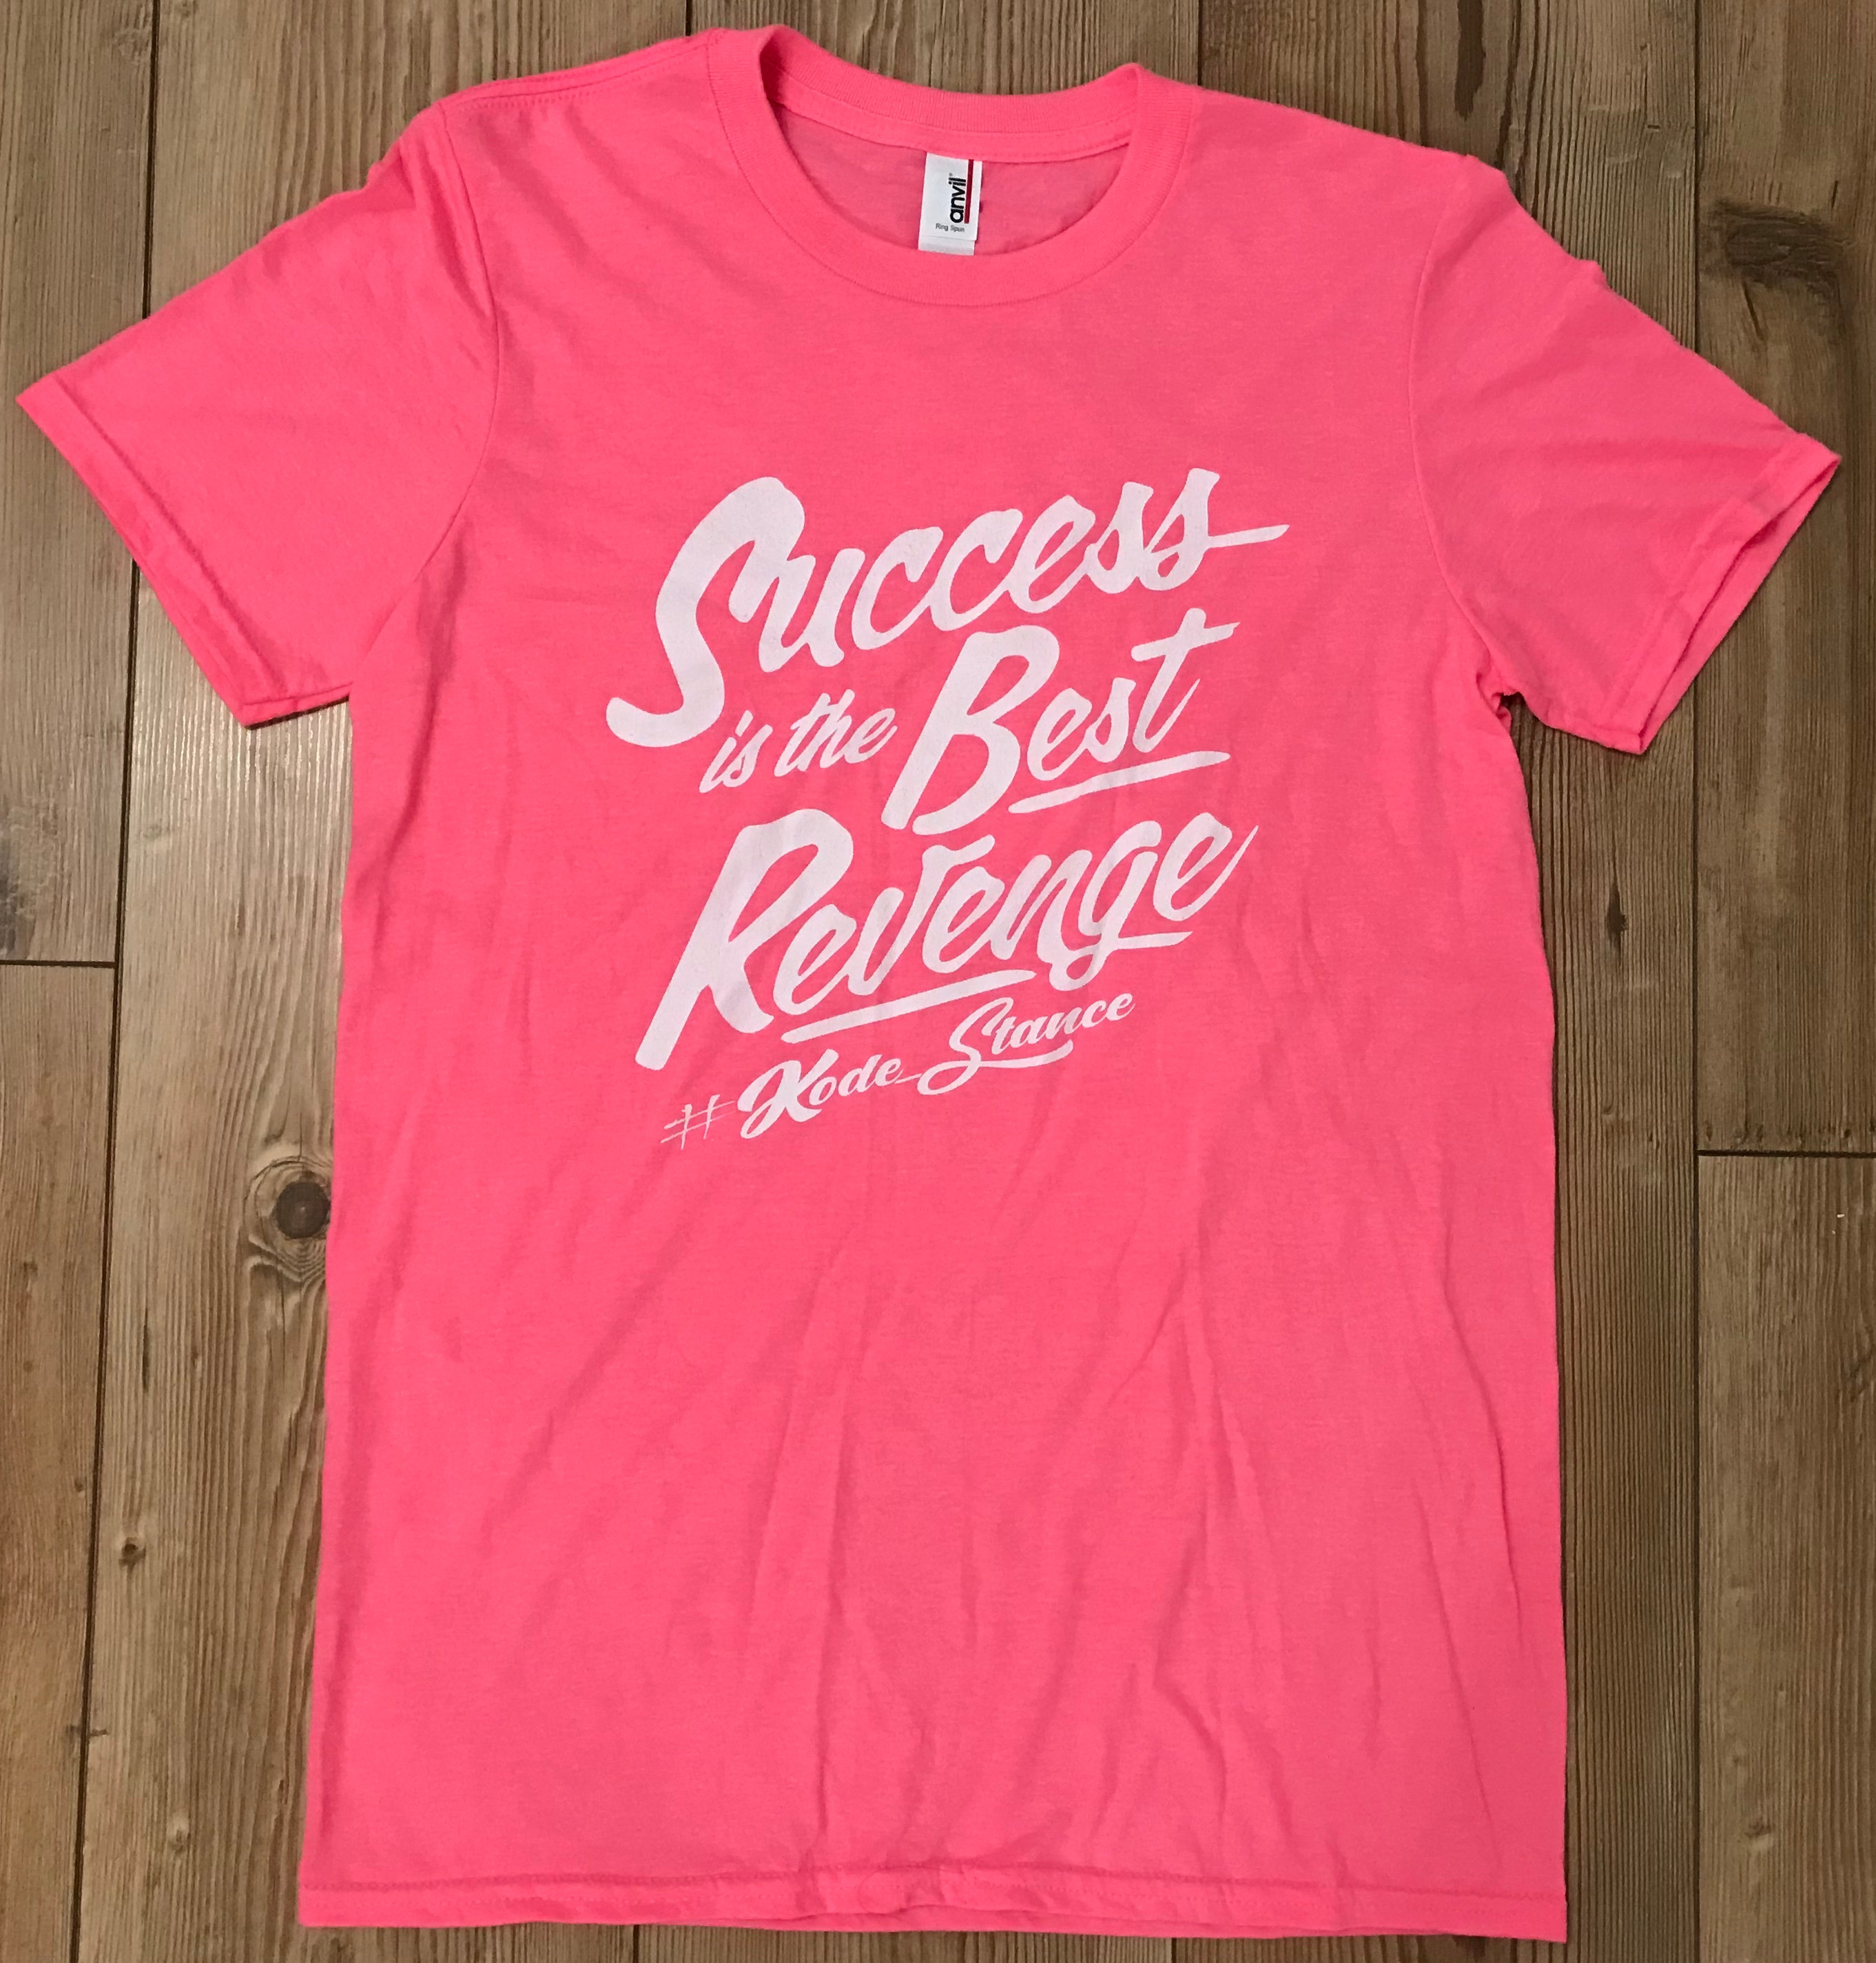 Kode Stance - Success Is The Best Revenge T-Shirt Pink